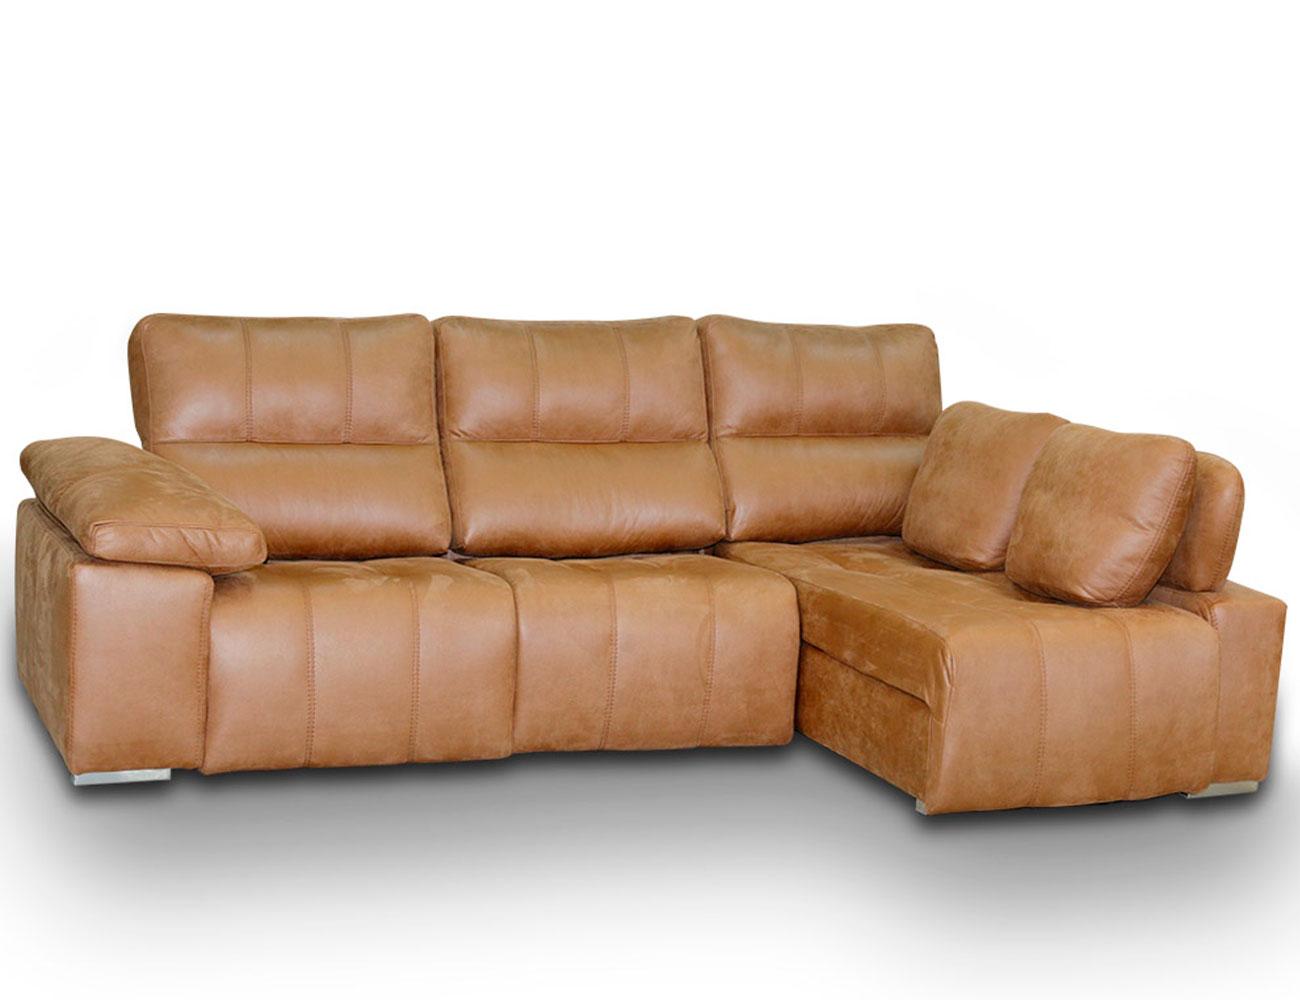 Sofa chaiselongue relax 2 motores anti manchas11